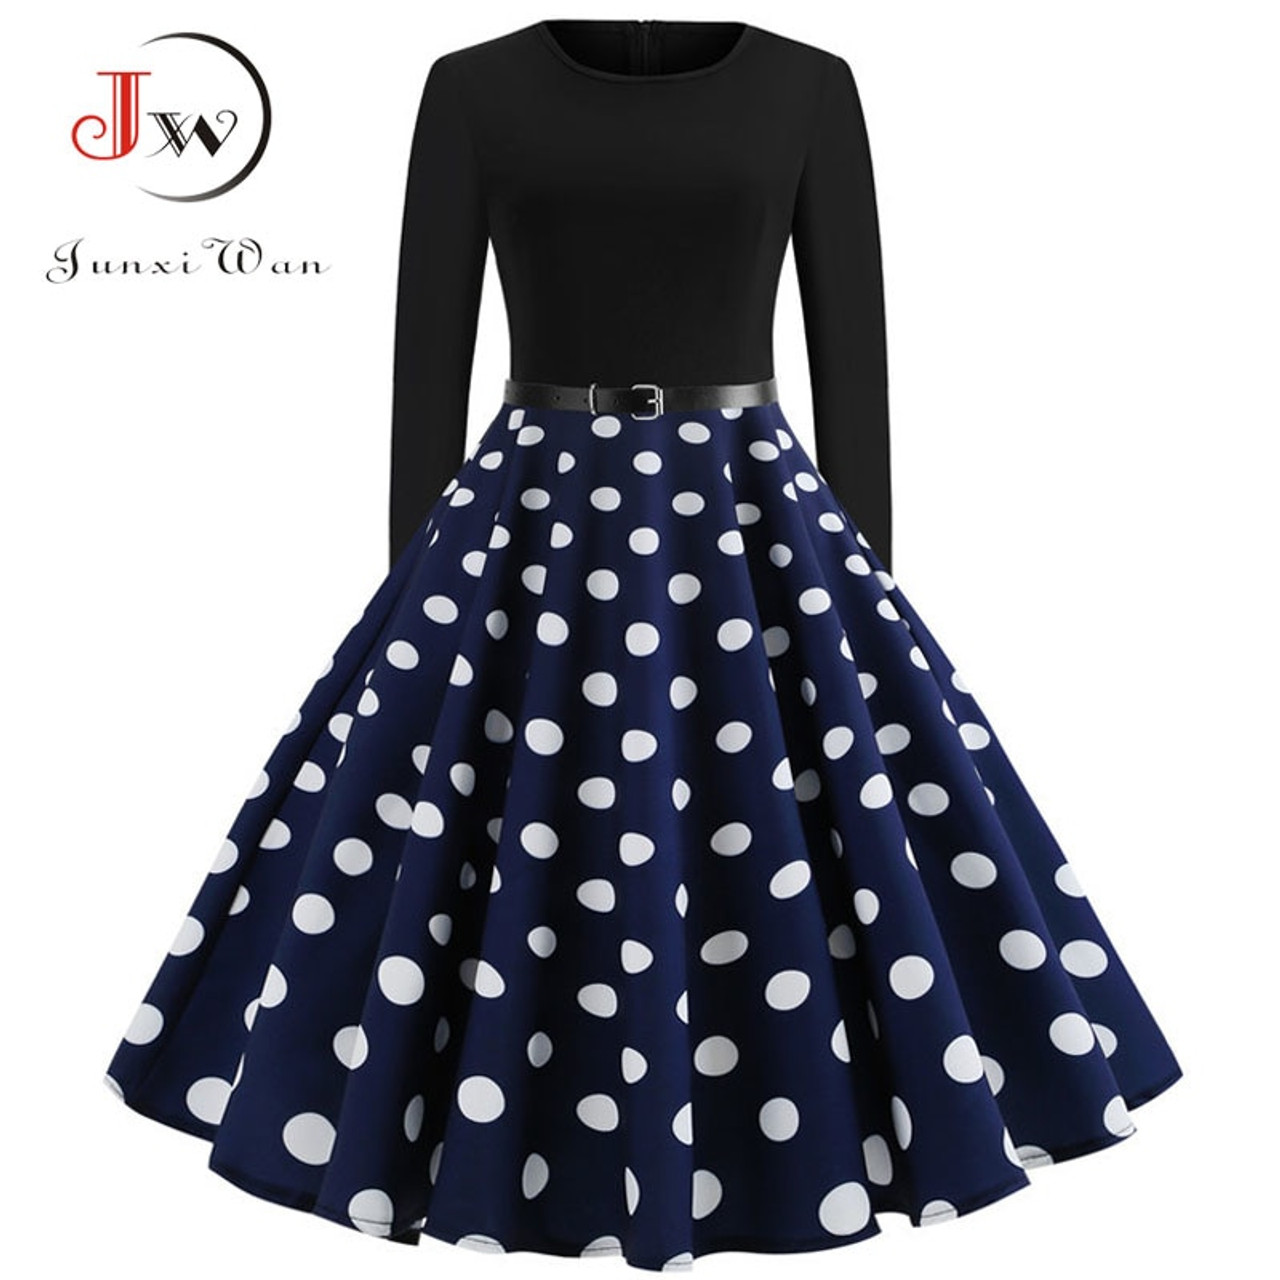 557f14e978227 Black Winter Dress Women Polka Dot Patchwork Elegant Vintage Dress Long  Sleeve Big Swing Plus Size Party Dresses Casual Chrismas